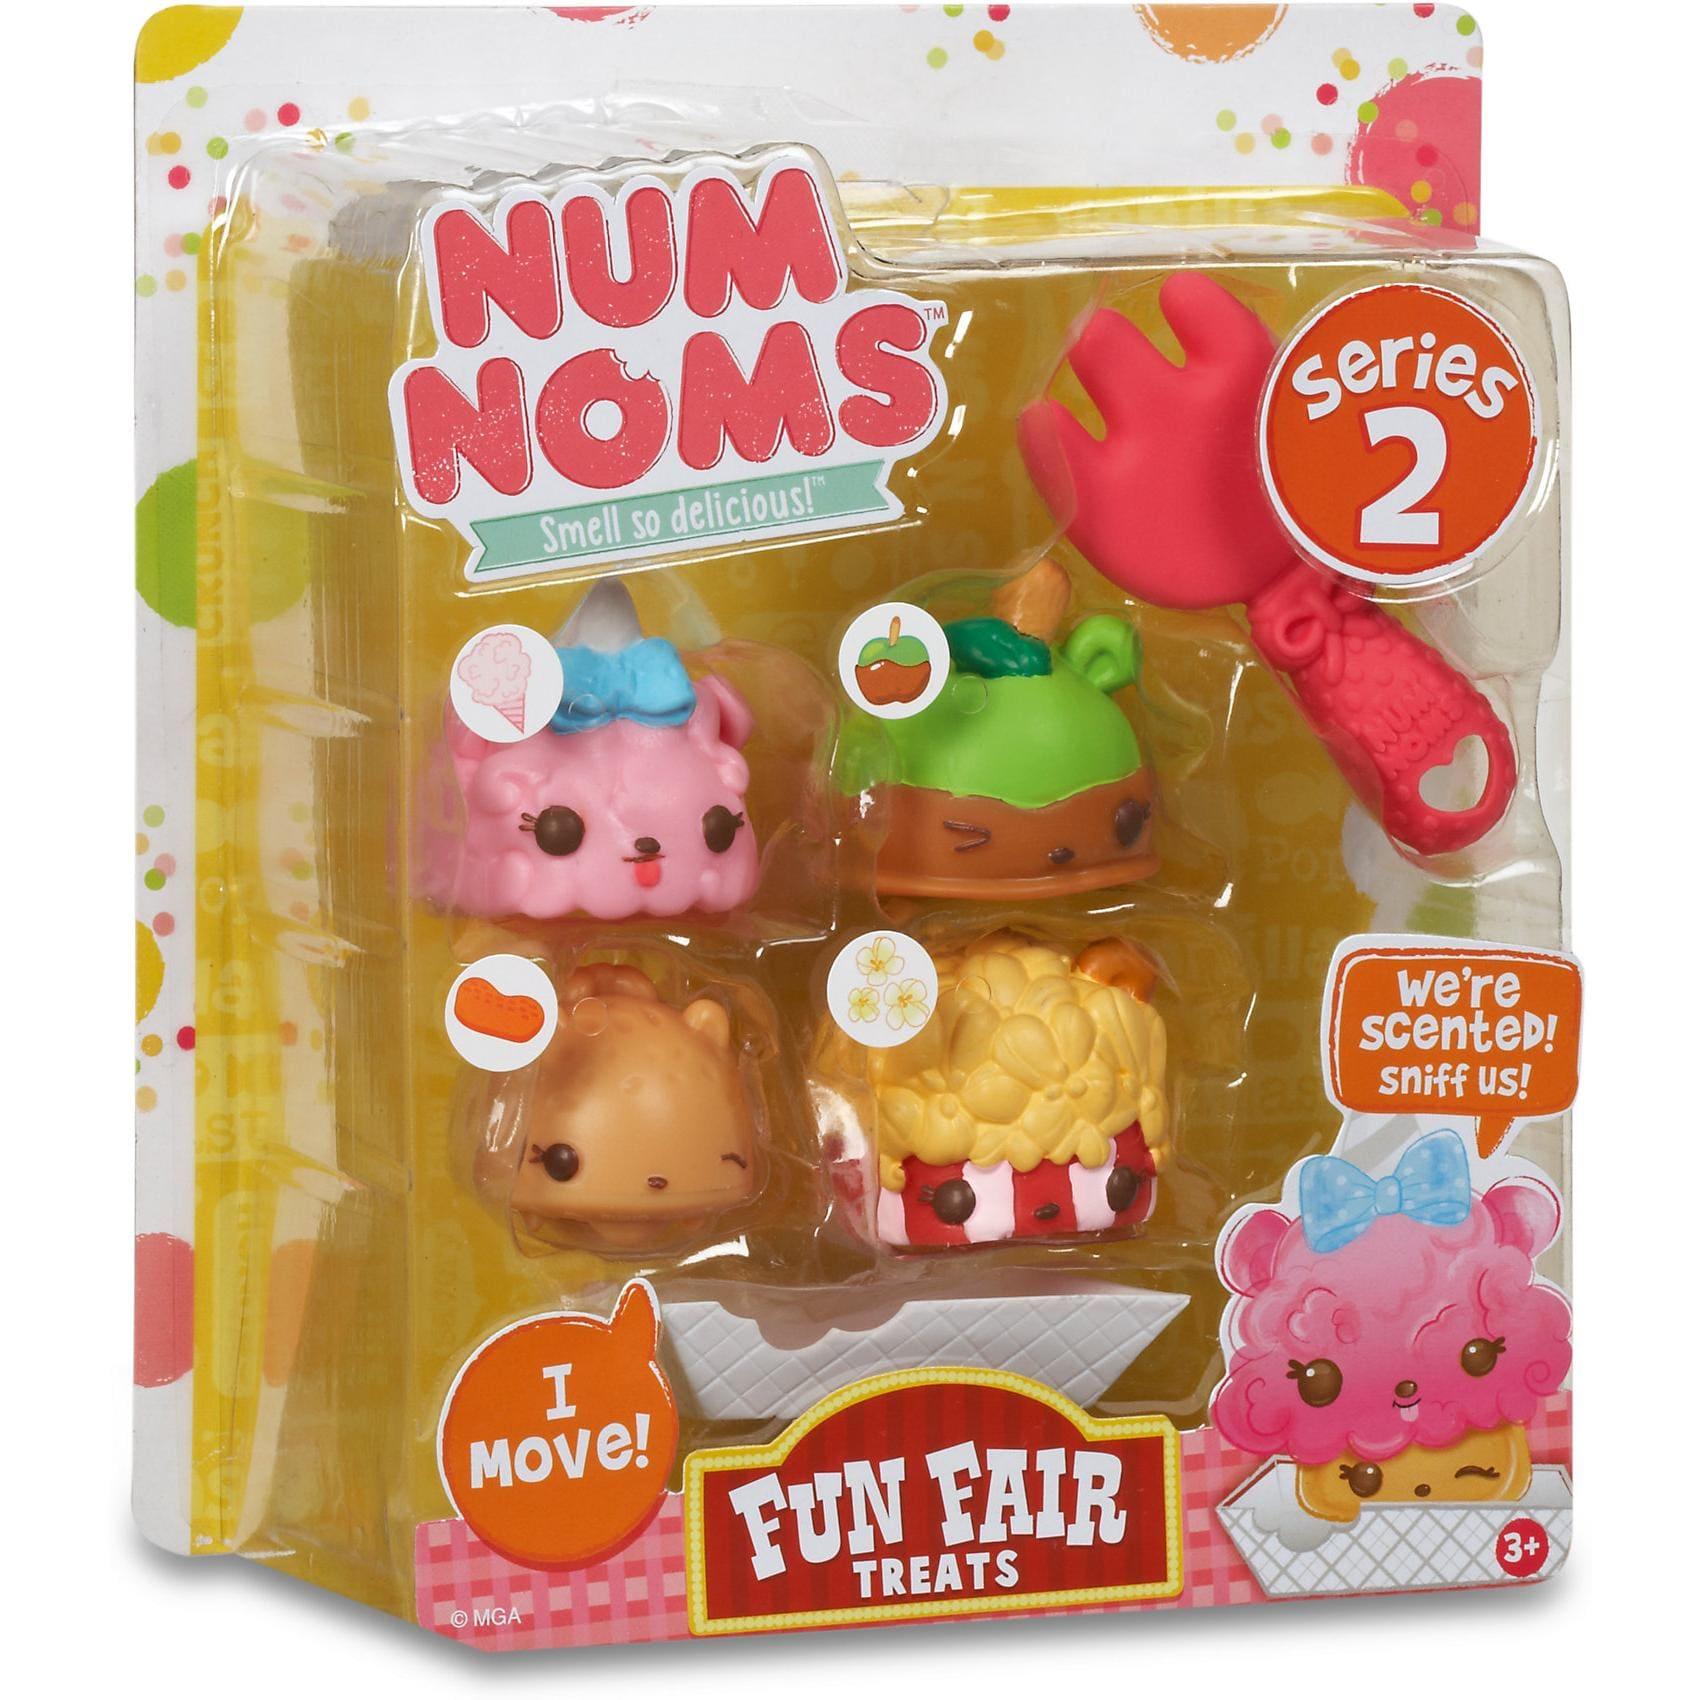 MGA Num Noms Starter Pack Fun Fair Treats